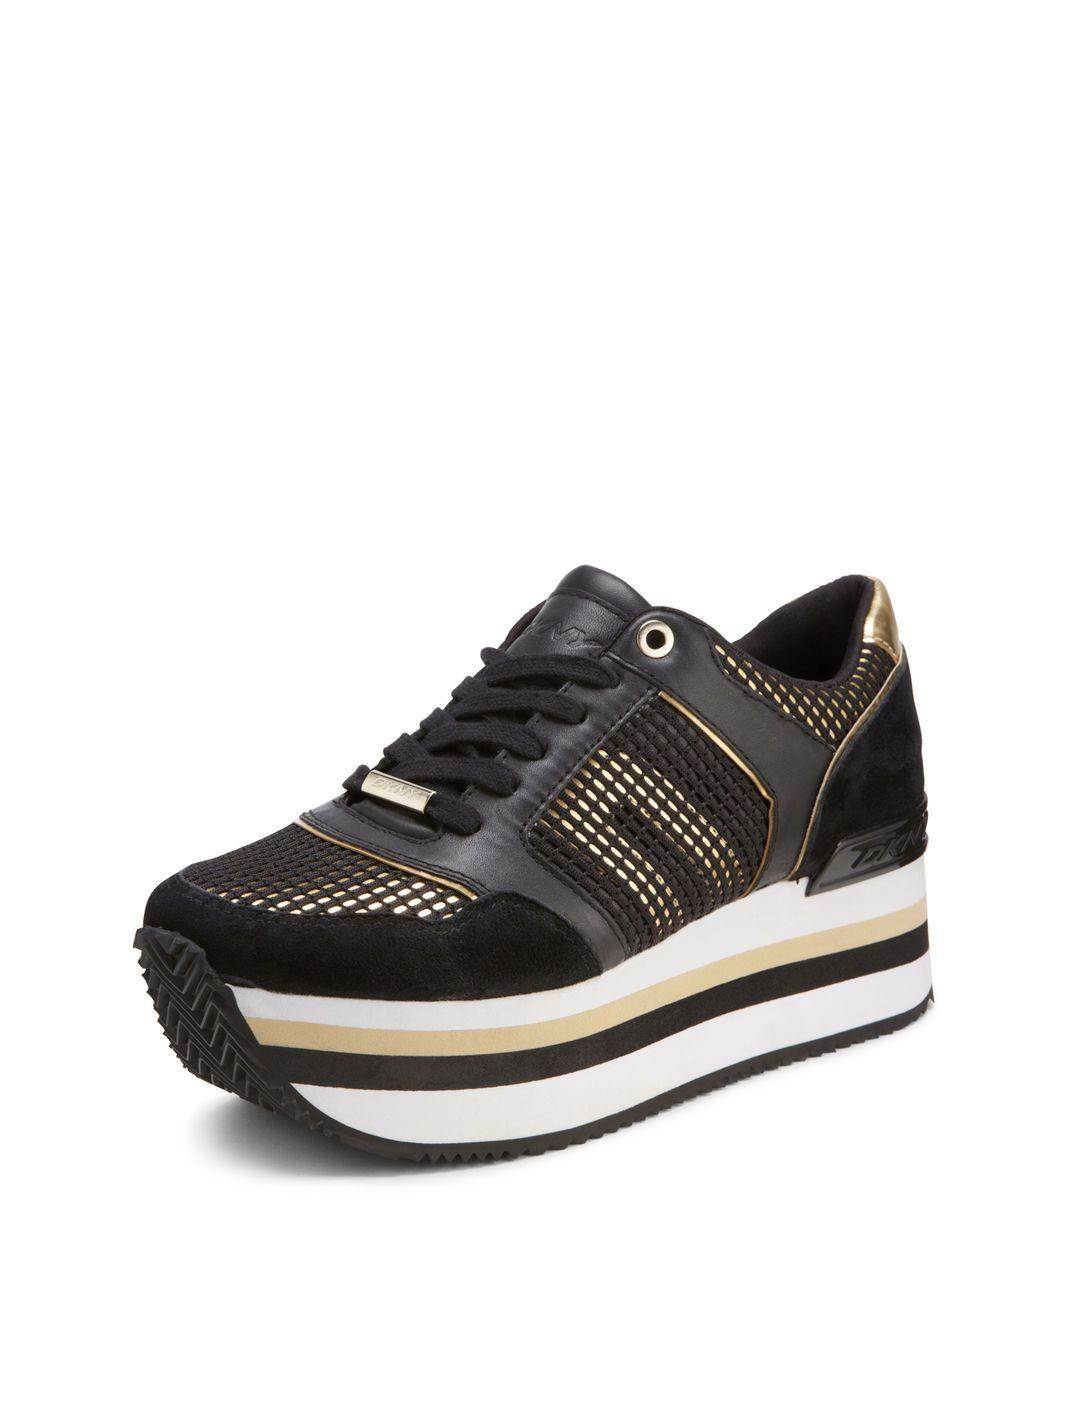 282123a791a Jill Platform Sneaker - DKNY